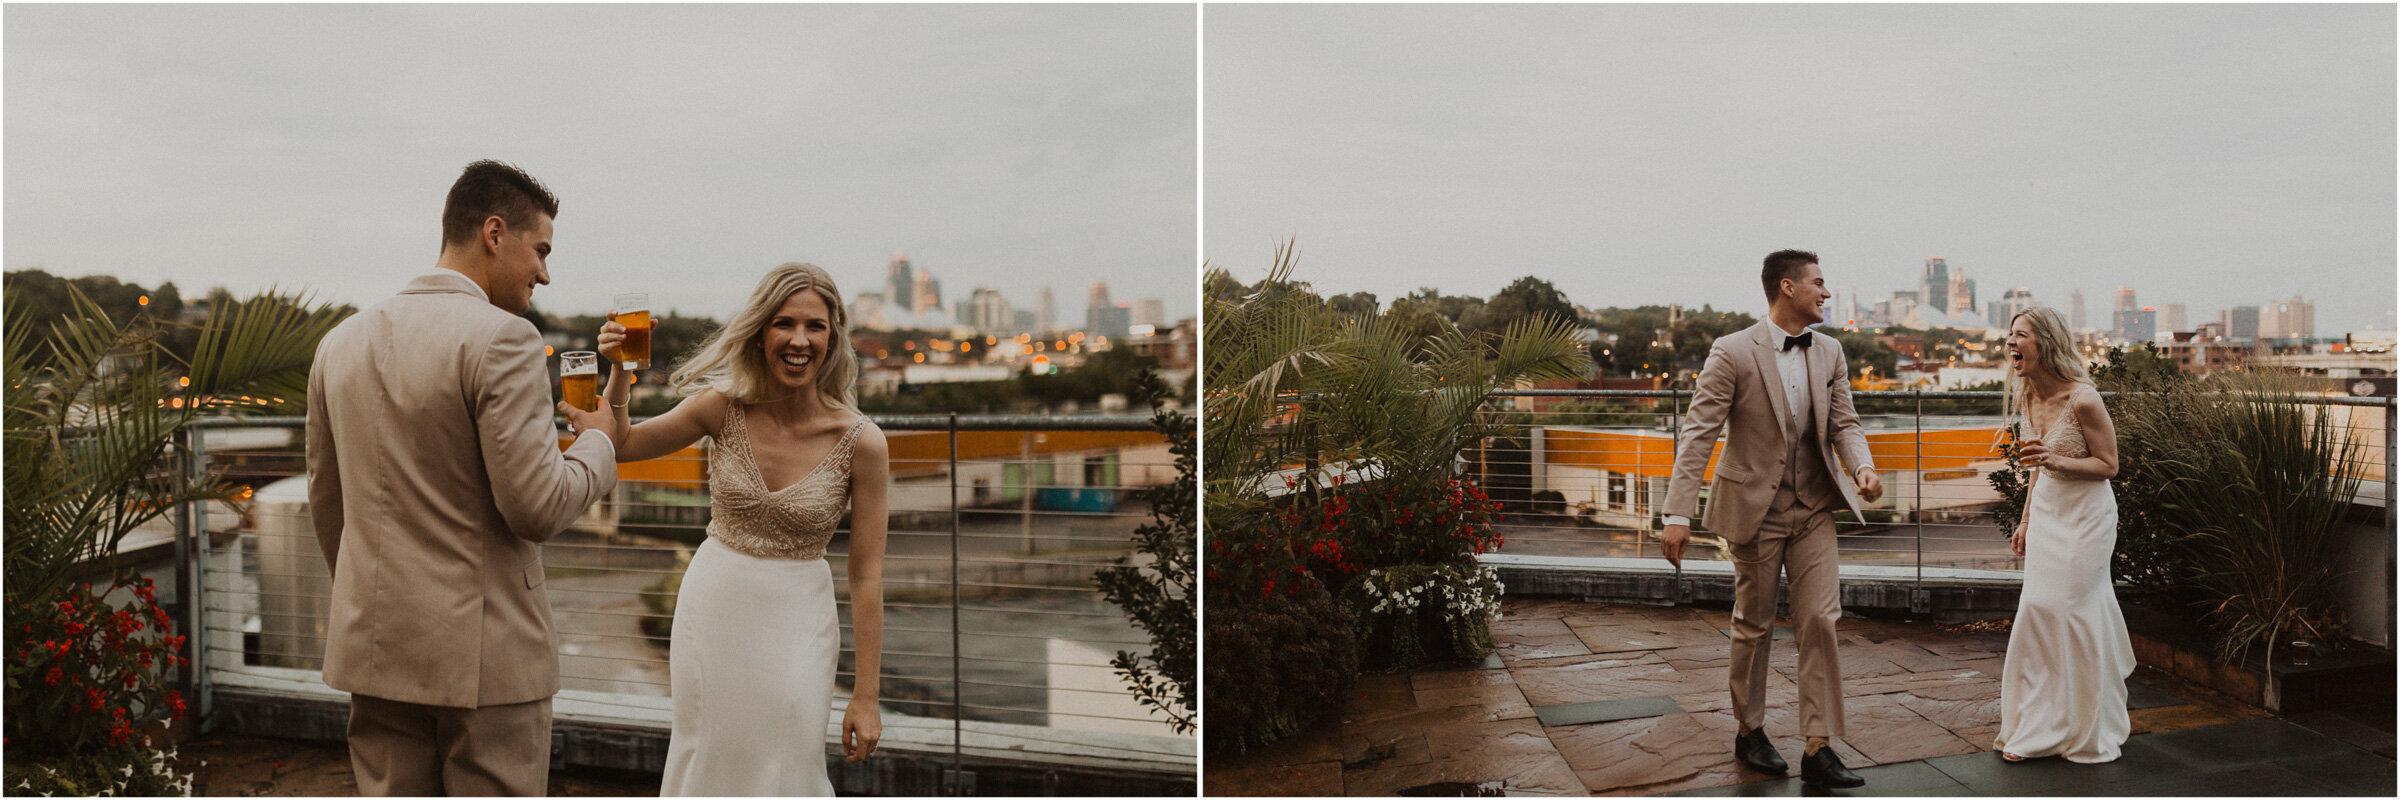 alyssa barletter photography downtown kansas city wedding boulevard brewery reception rainy day wedding-48.jpg